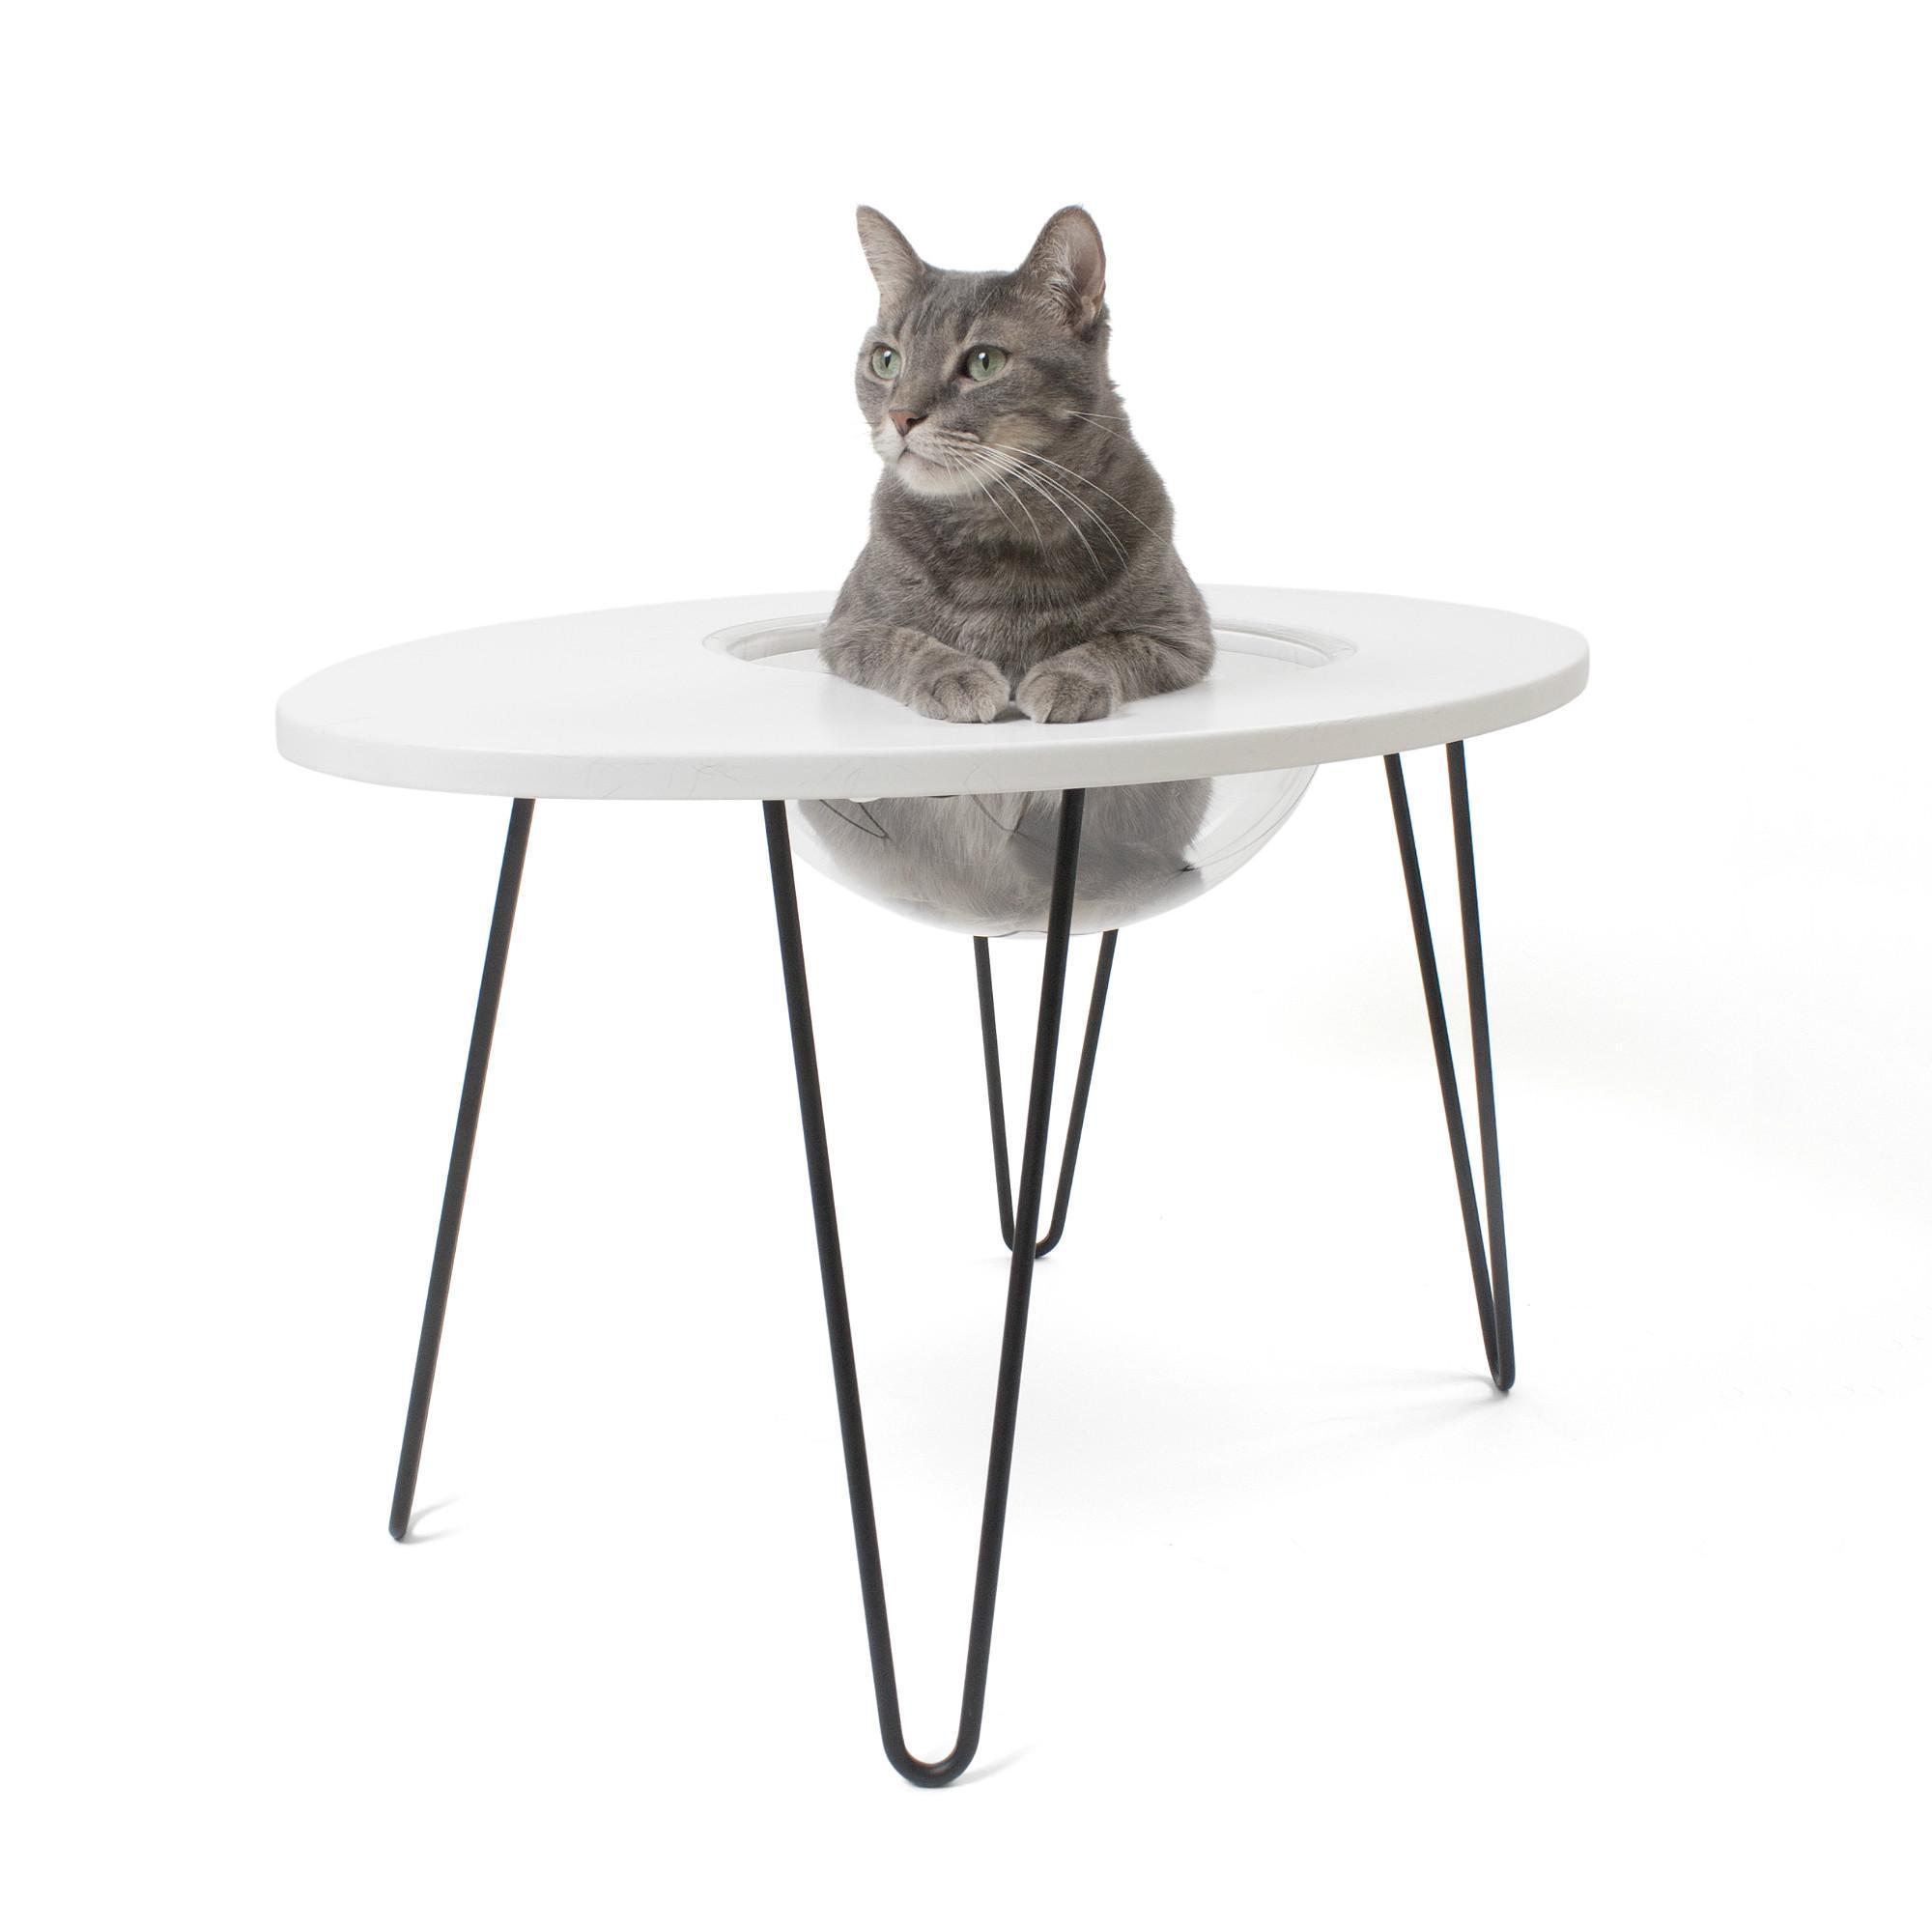 Primetime Petz Hauspanther NestEgg Side Table & Cat Bed